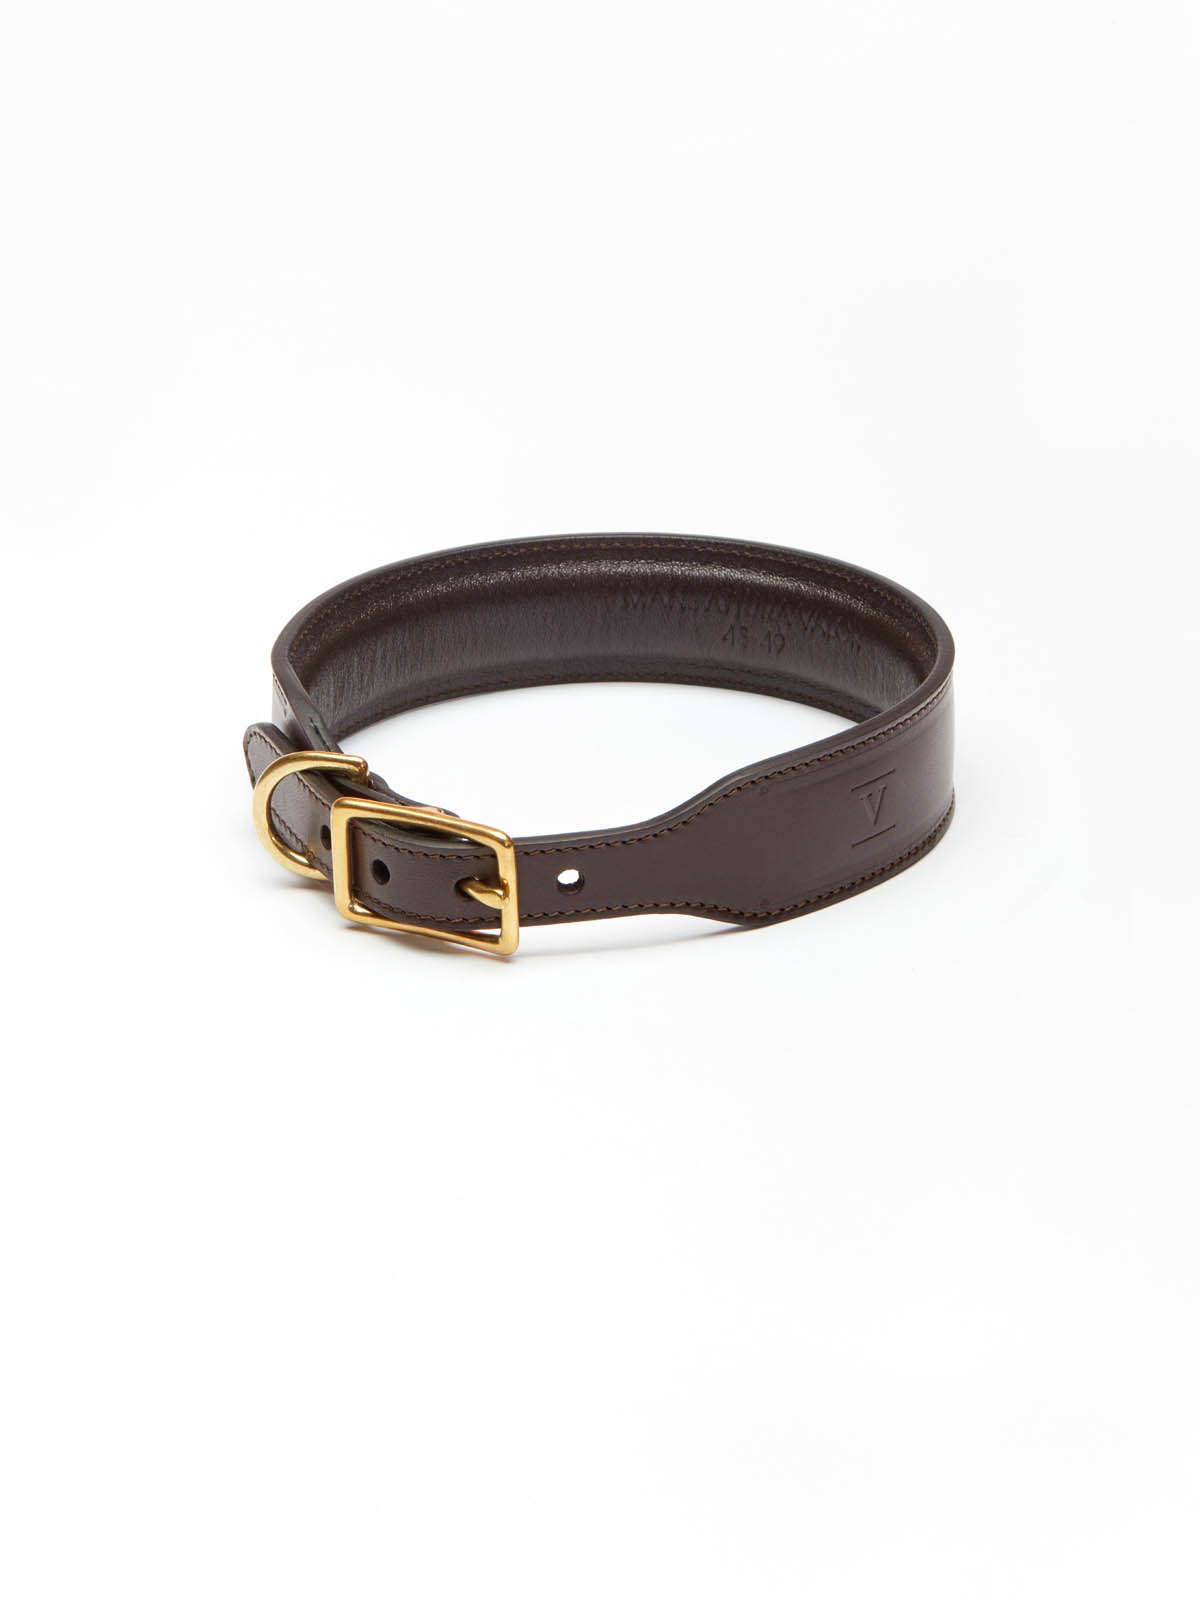 designer leather dog collar